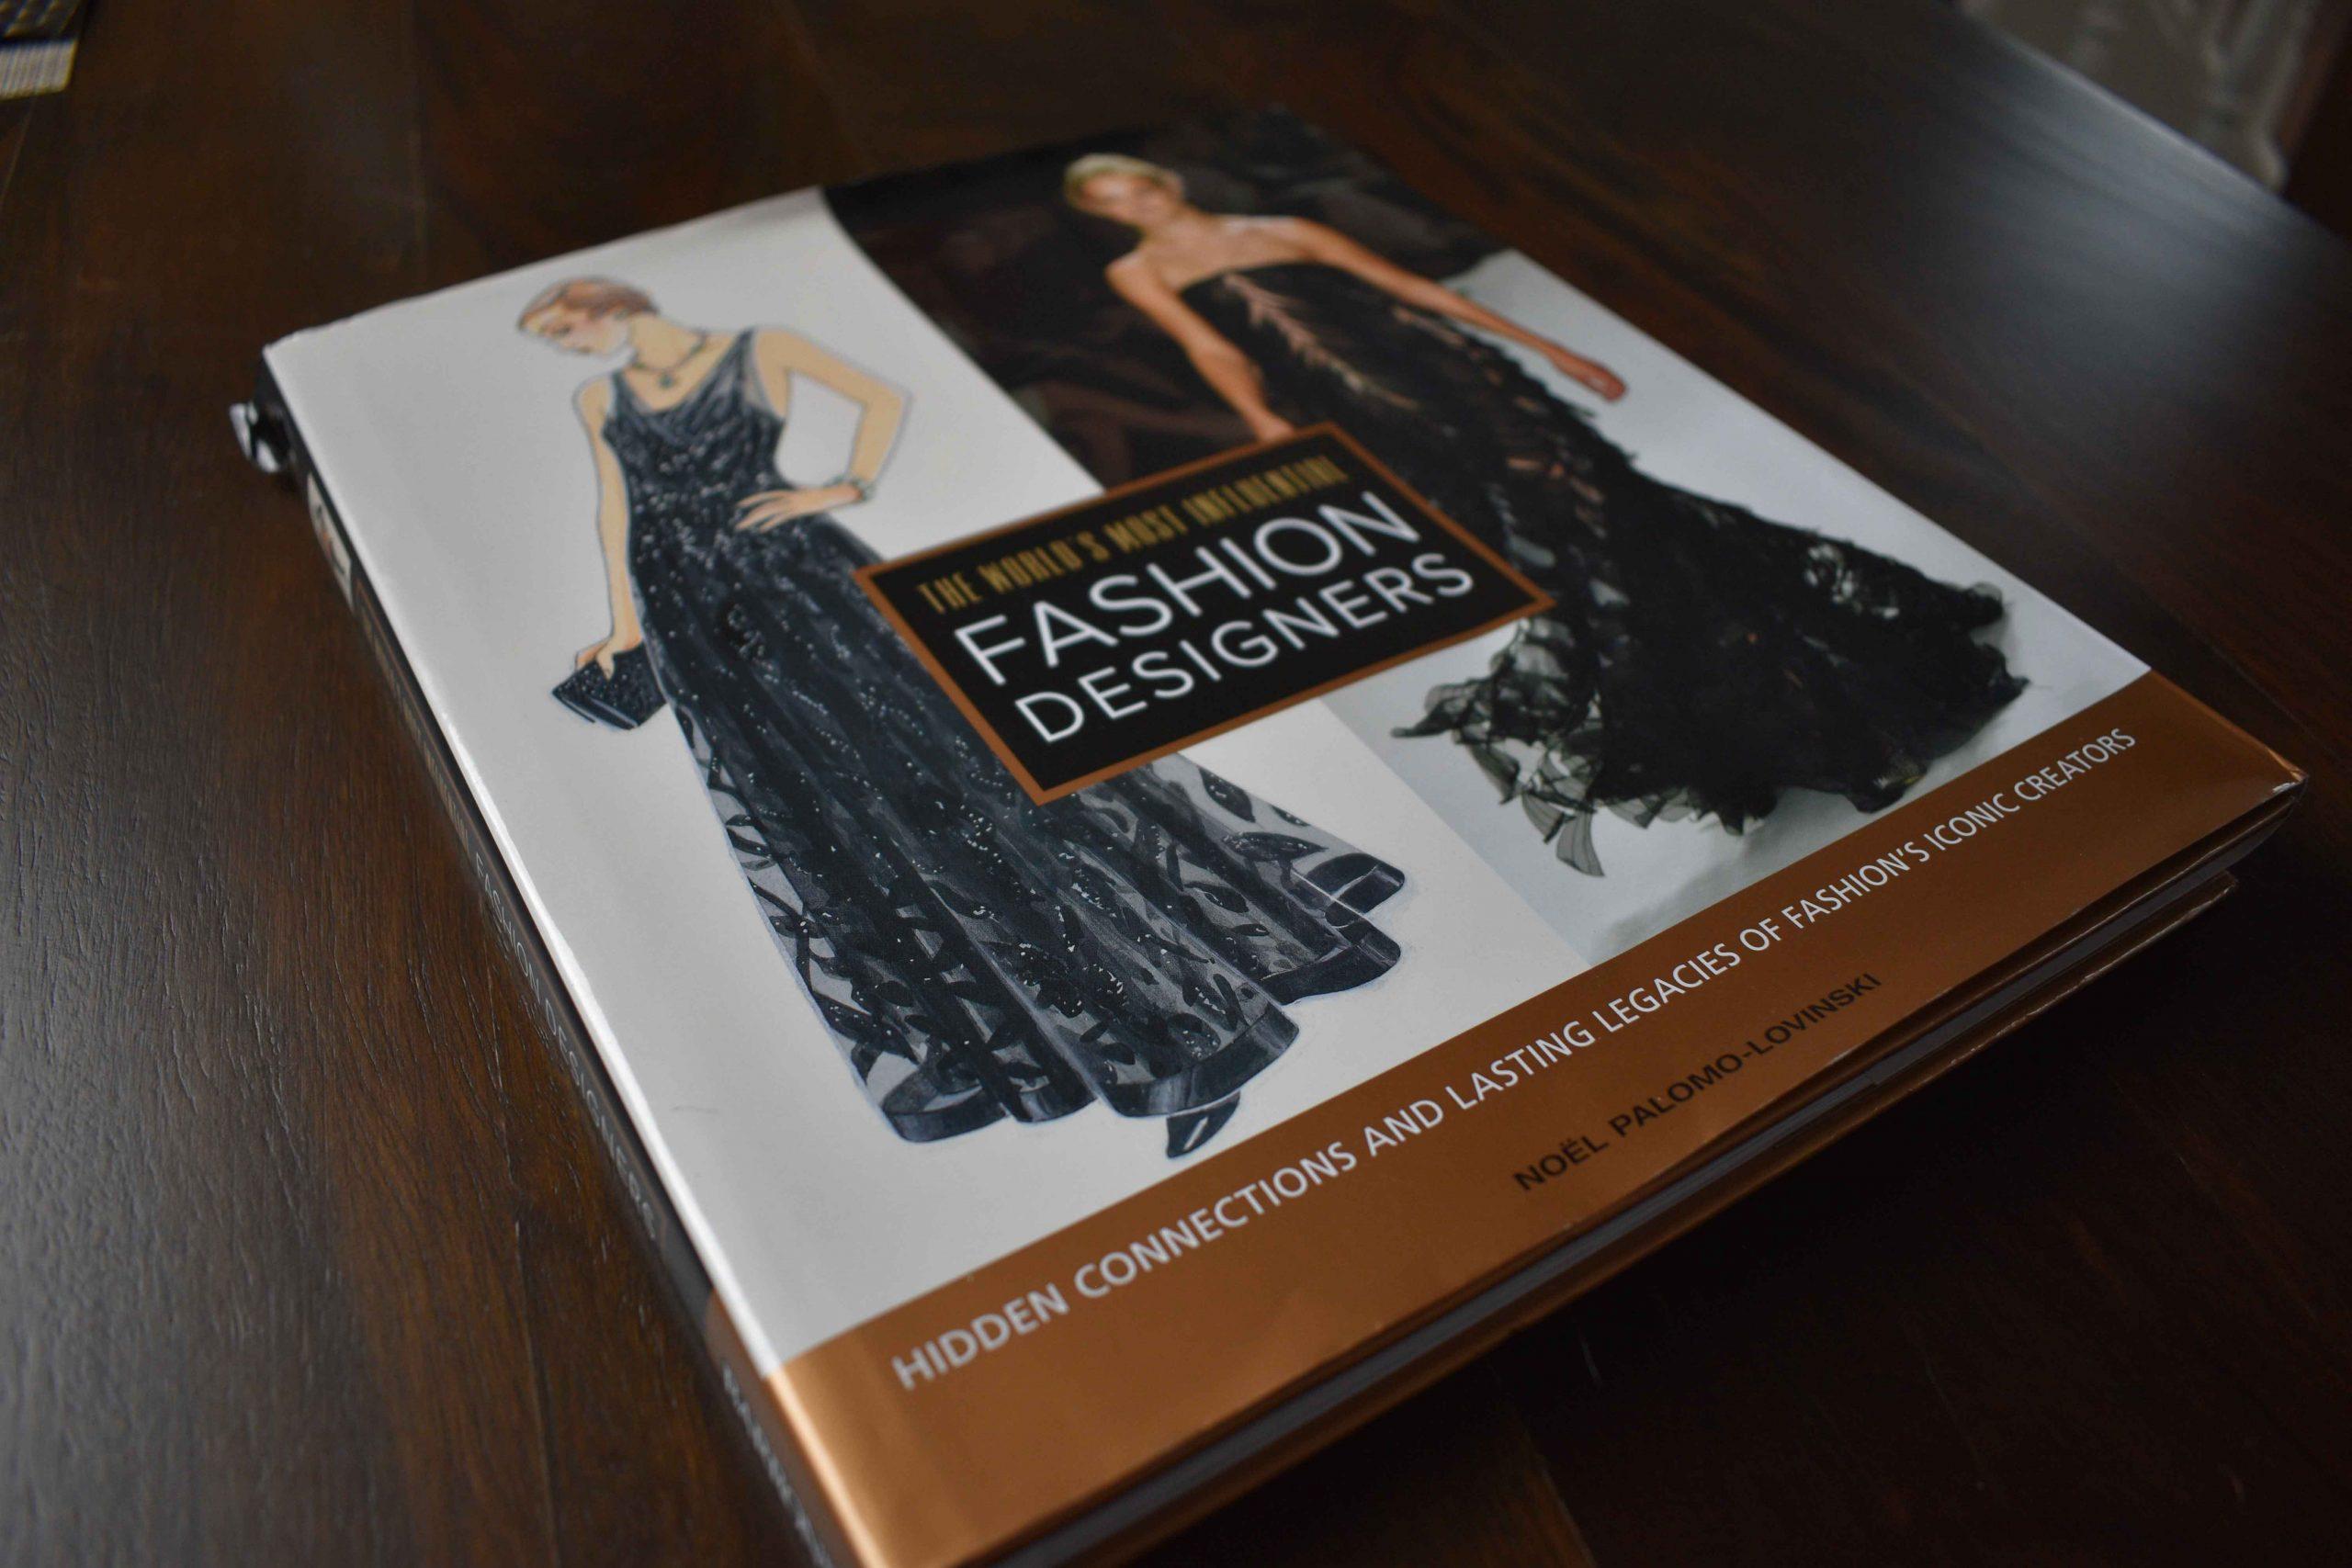 Best Fashion books - Fashion Designers